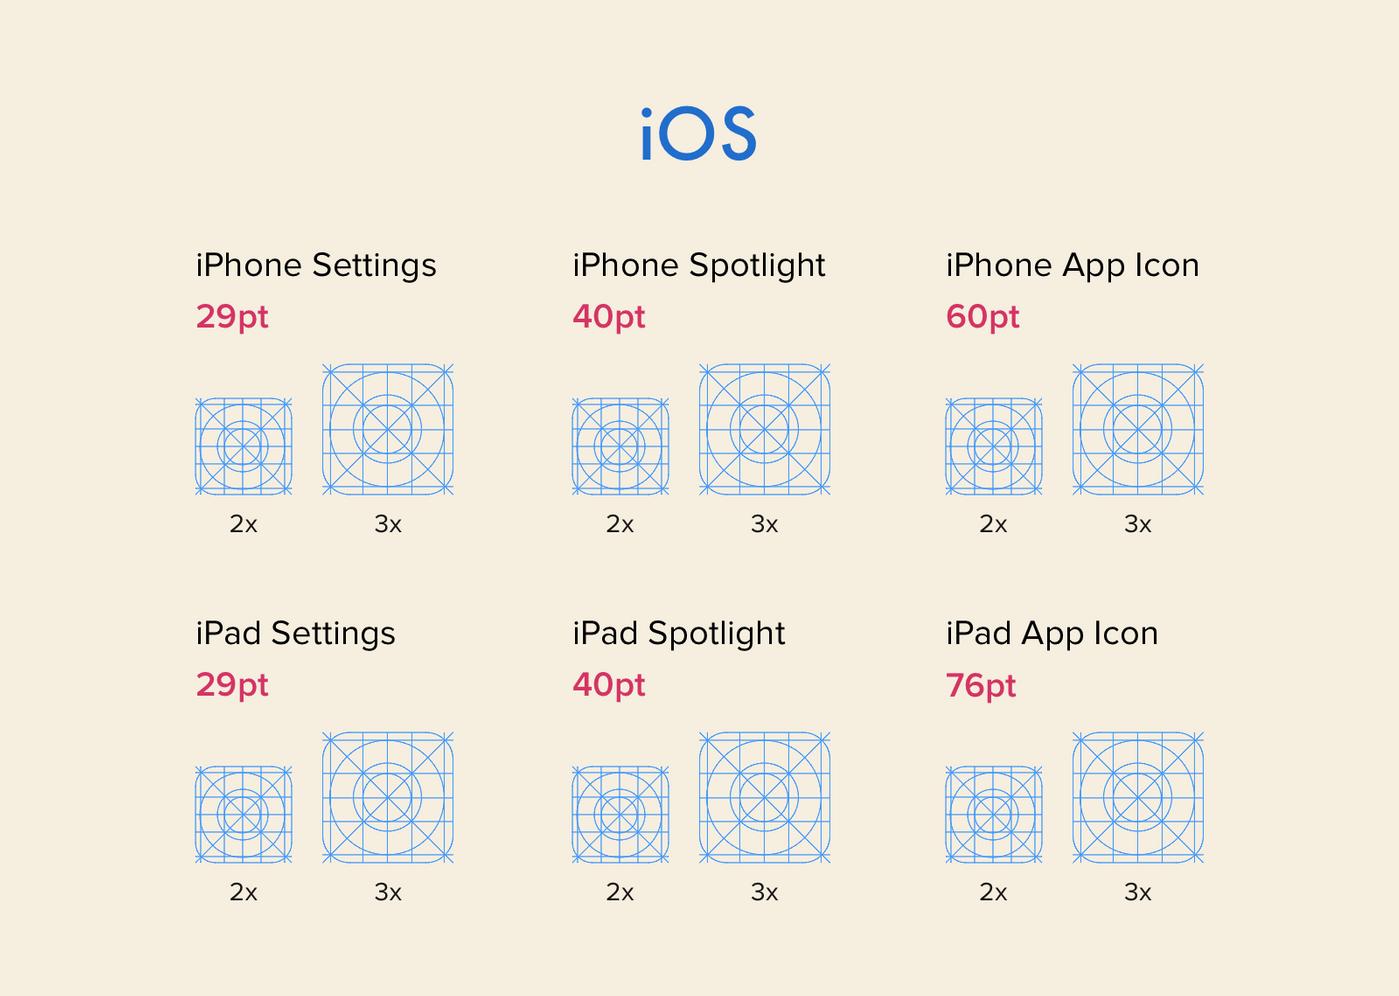 iOS size greed